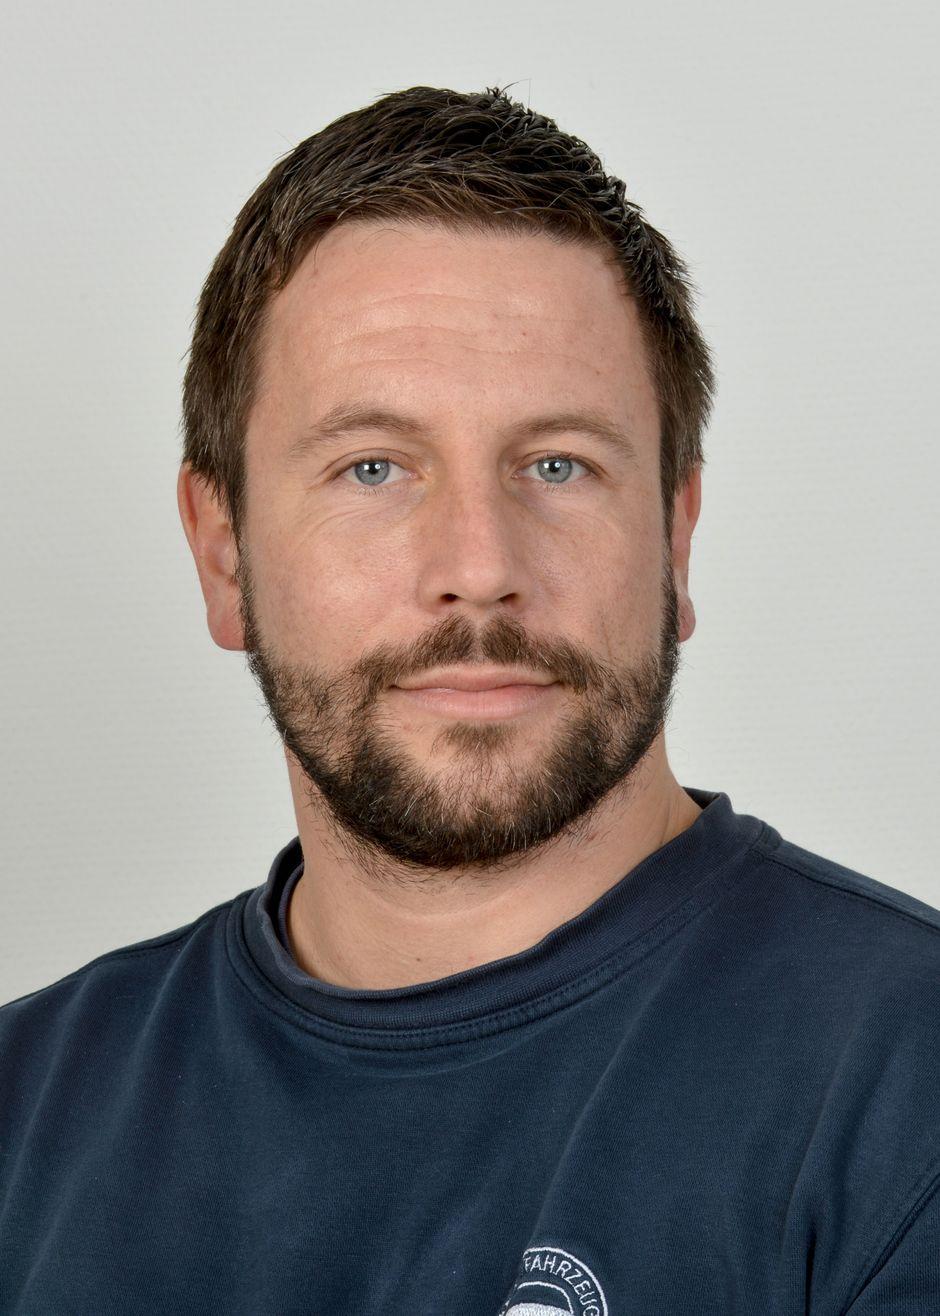 Christian Kurzweg